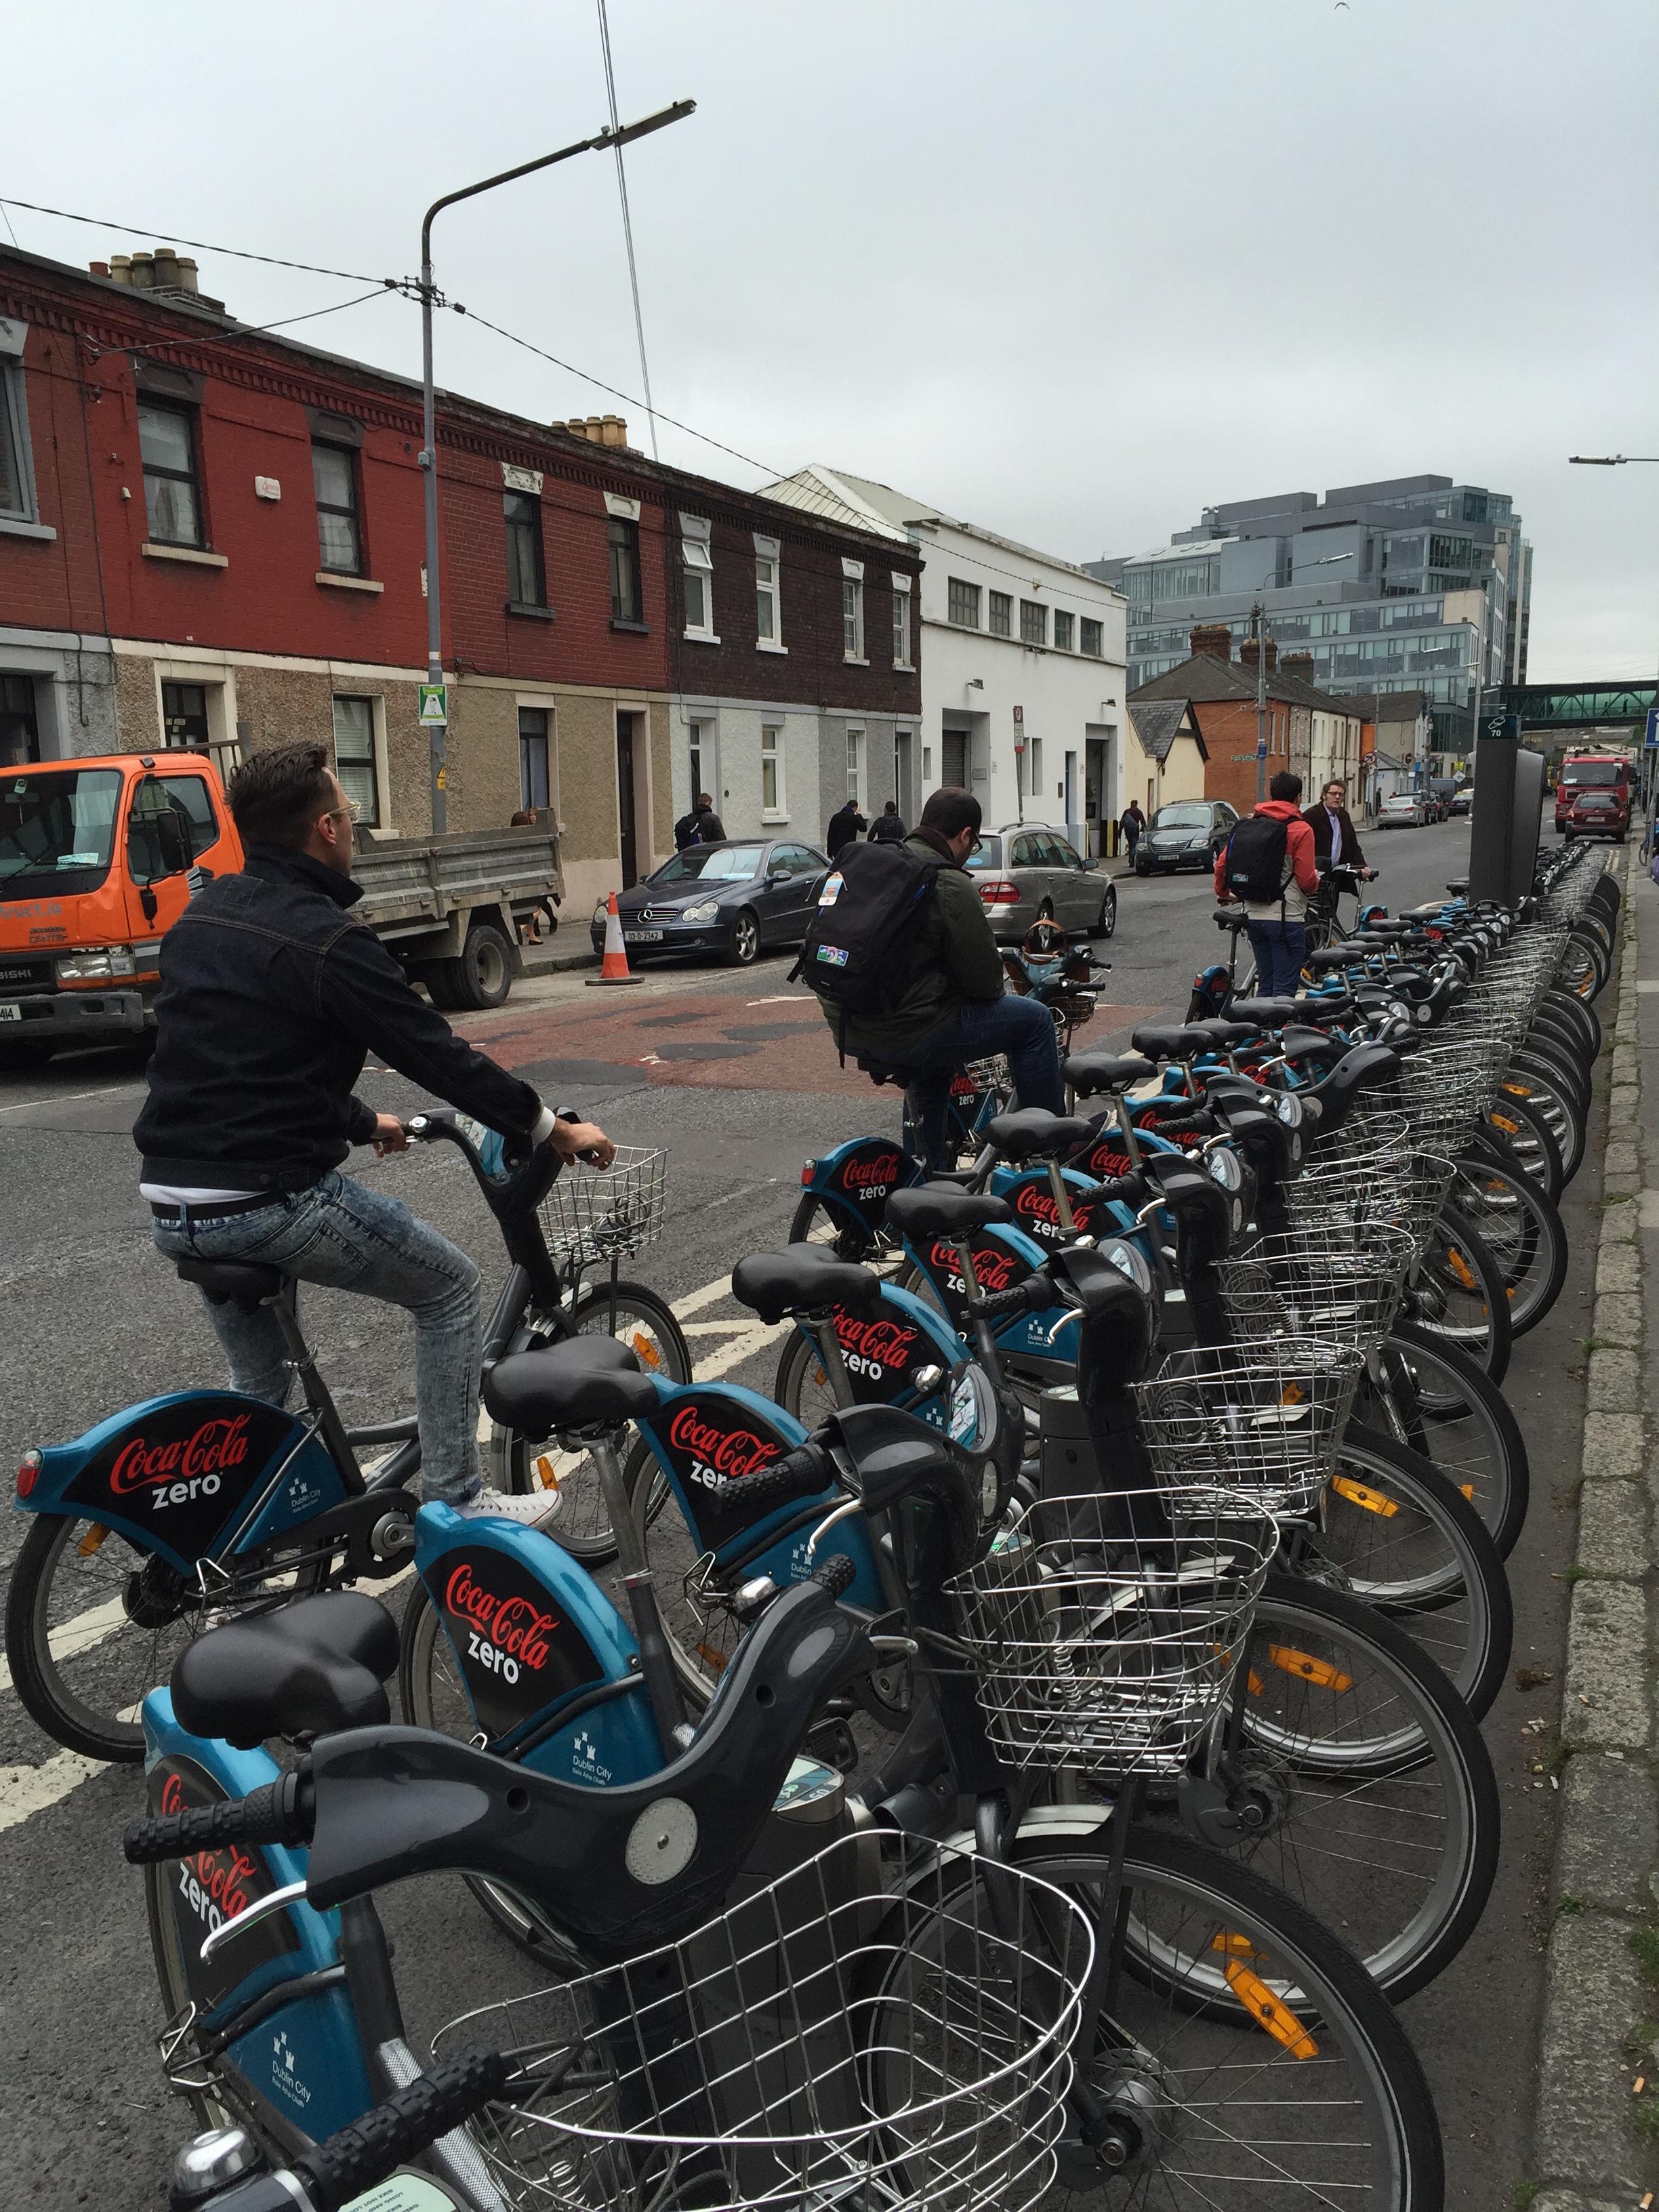 Three men waiting to dock their bikes at bike rack